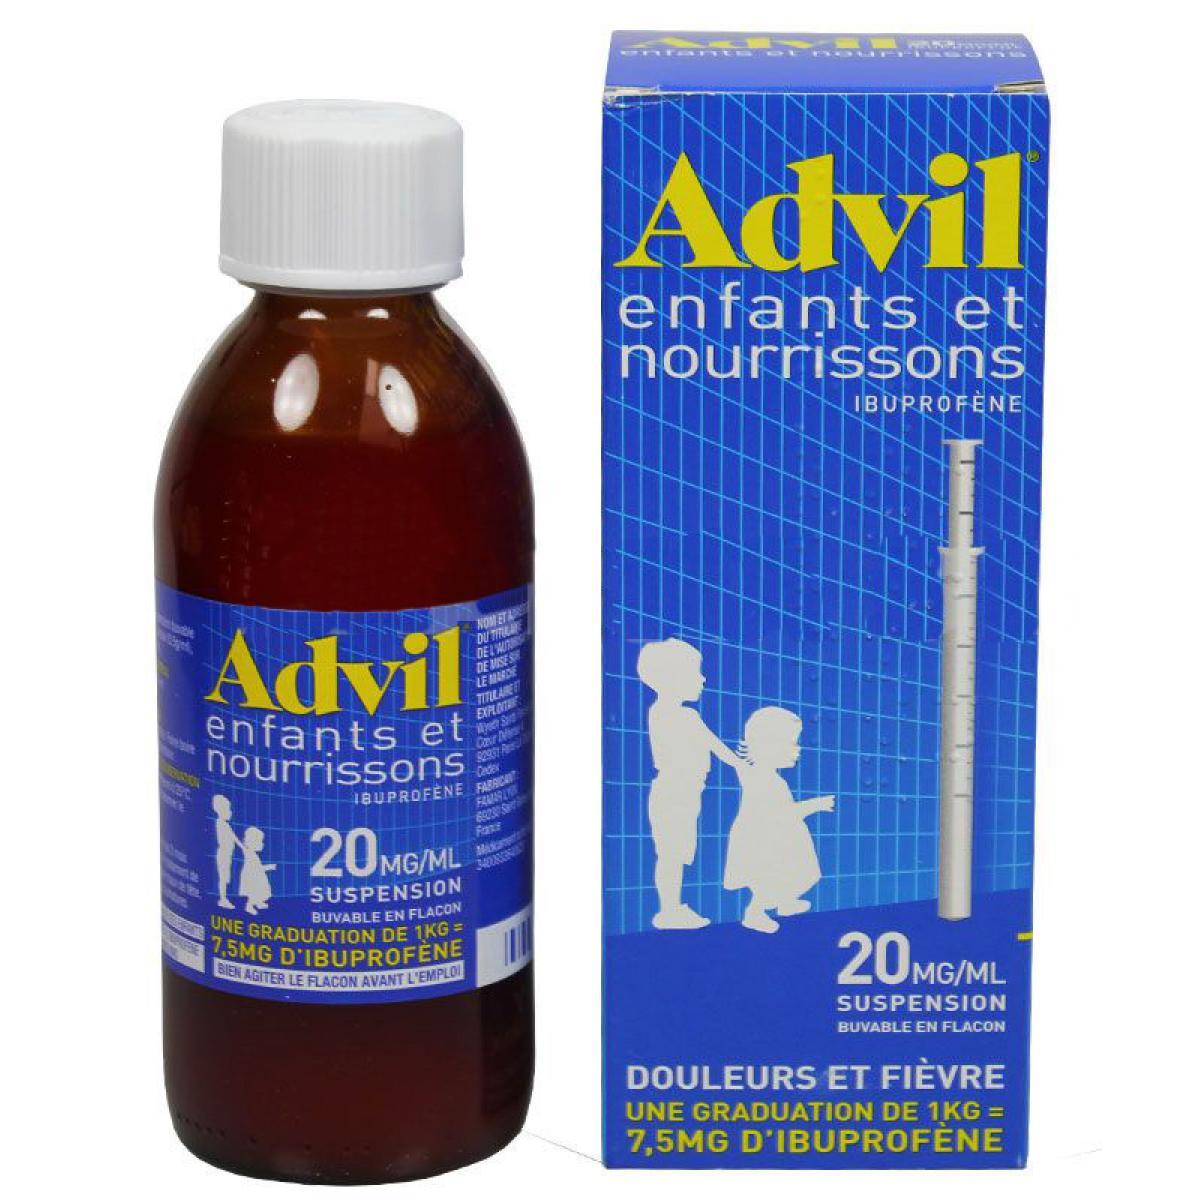 pfizer advil enfants et nourrissons 20mg 1ml suspension 200ml m dicaments pharmarket. Black Bedroom Furniture Sets. Home Design Ideas